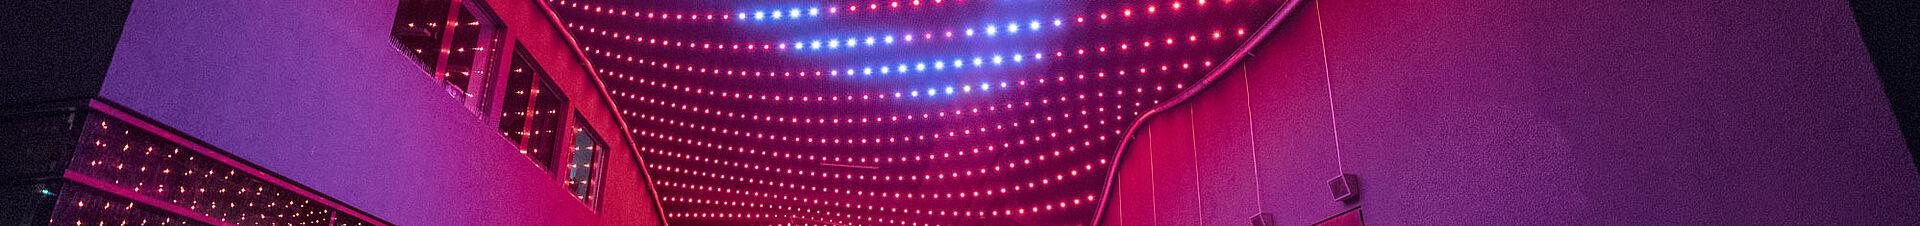 LED Lichtdesign X-LED Carl Stahl Architektur WCCB Bonn